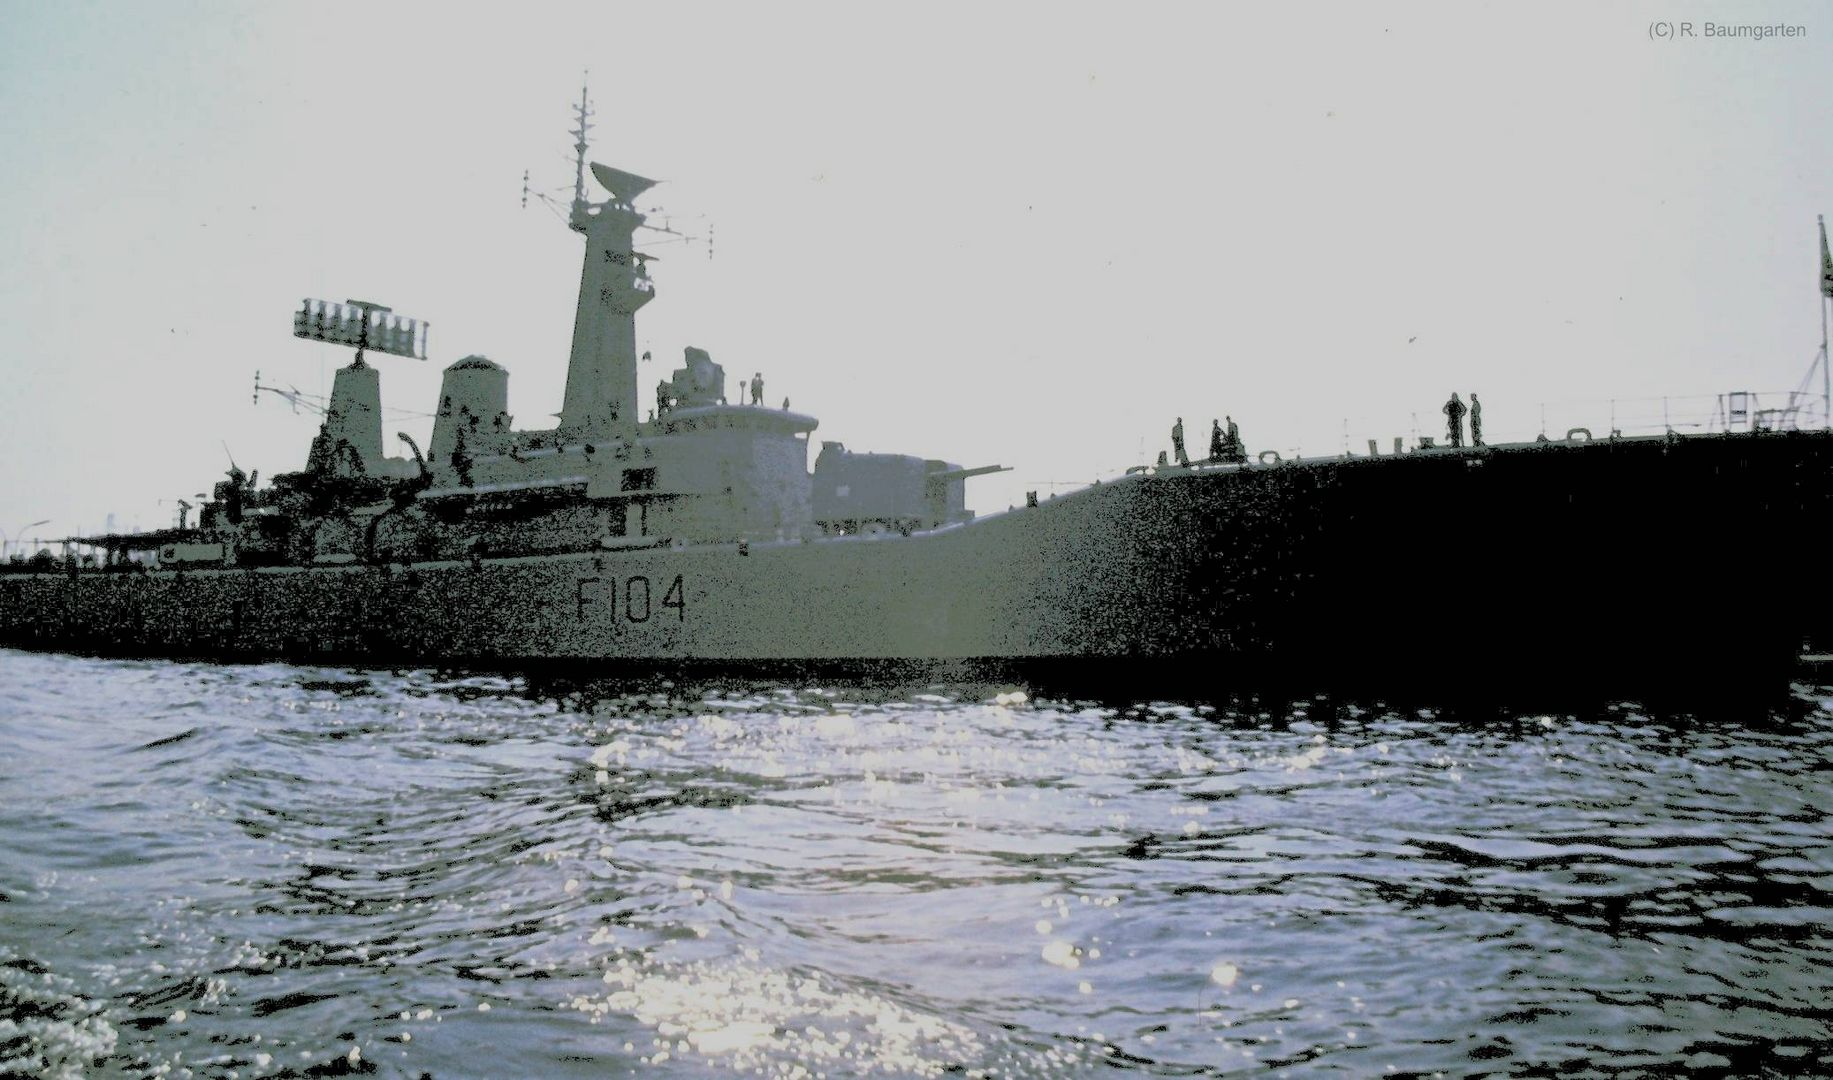 Fregatte HMS Dido F104 Frigate im Hamburger Hafen